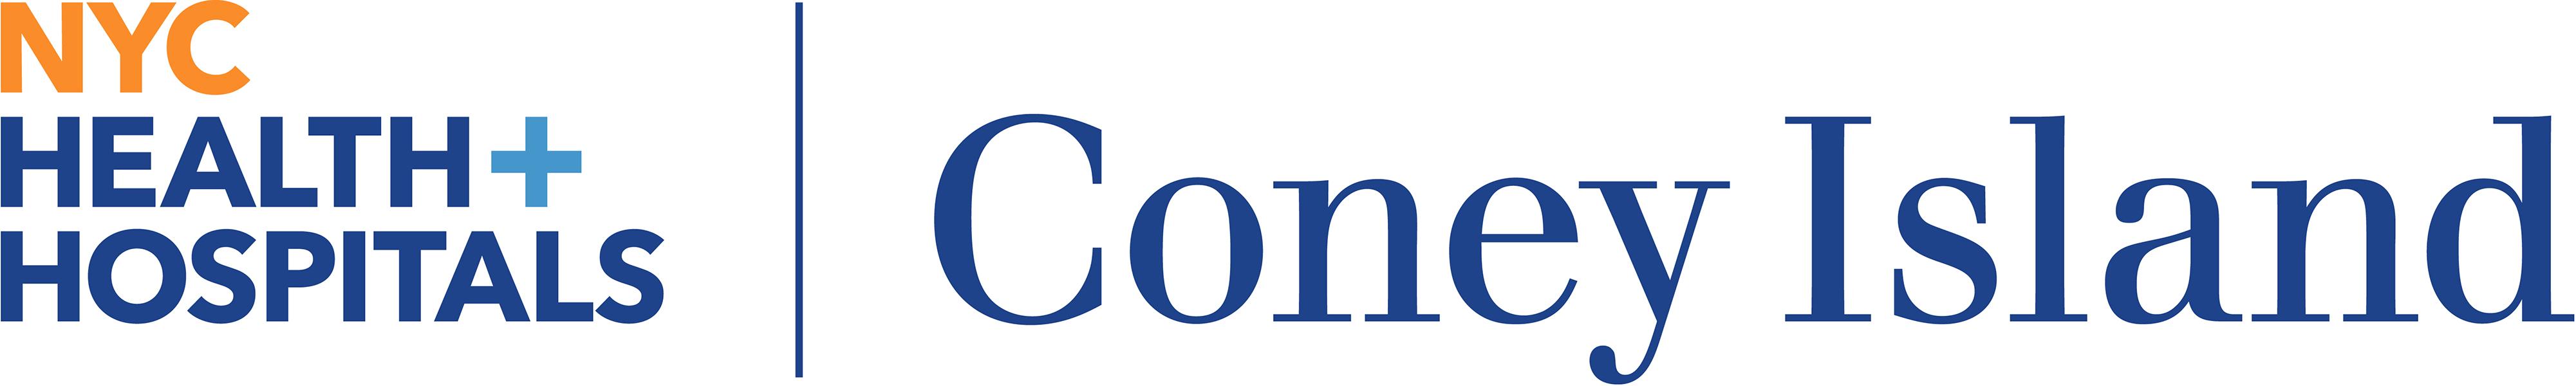 NYC Health+Hospitals: CONEY ISLAND